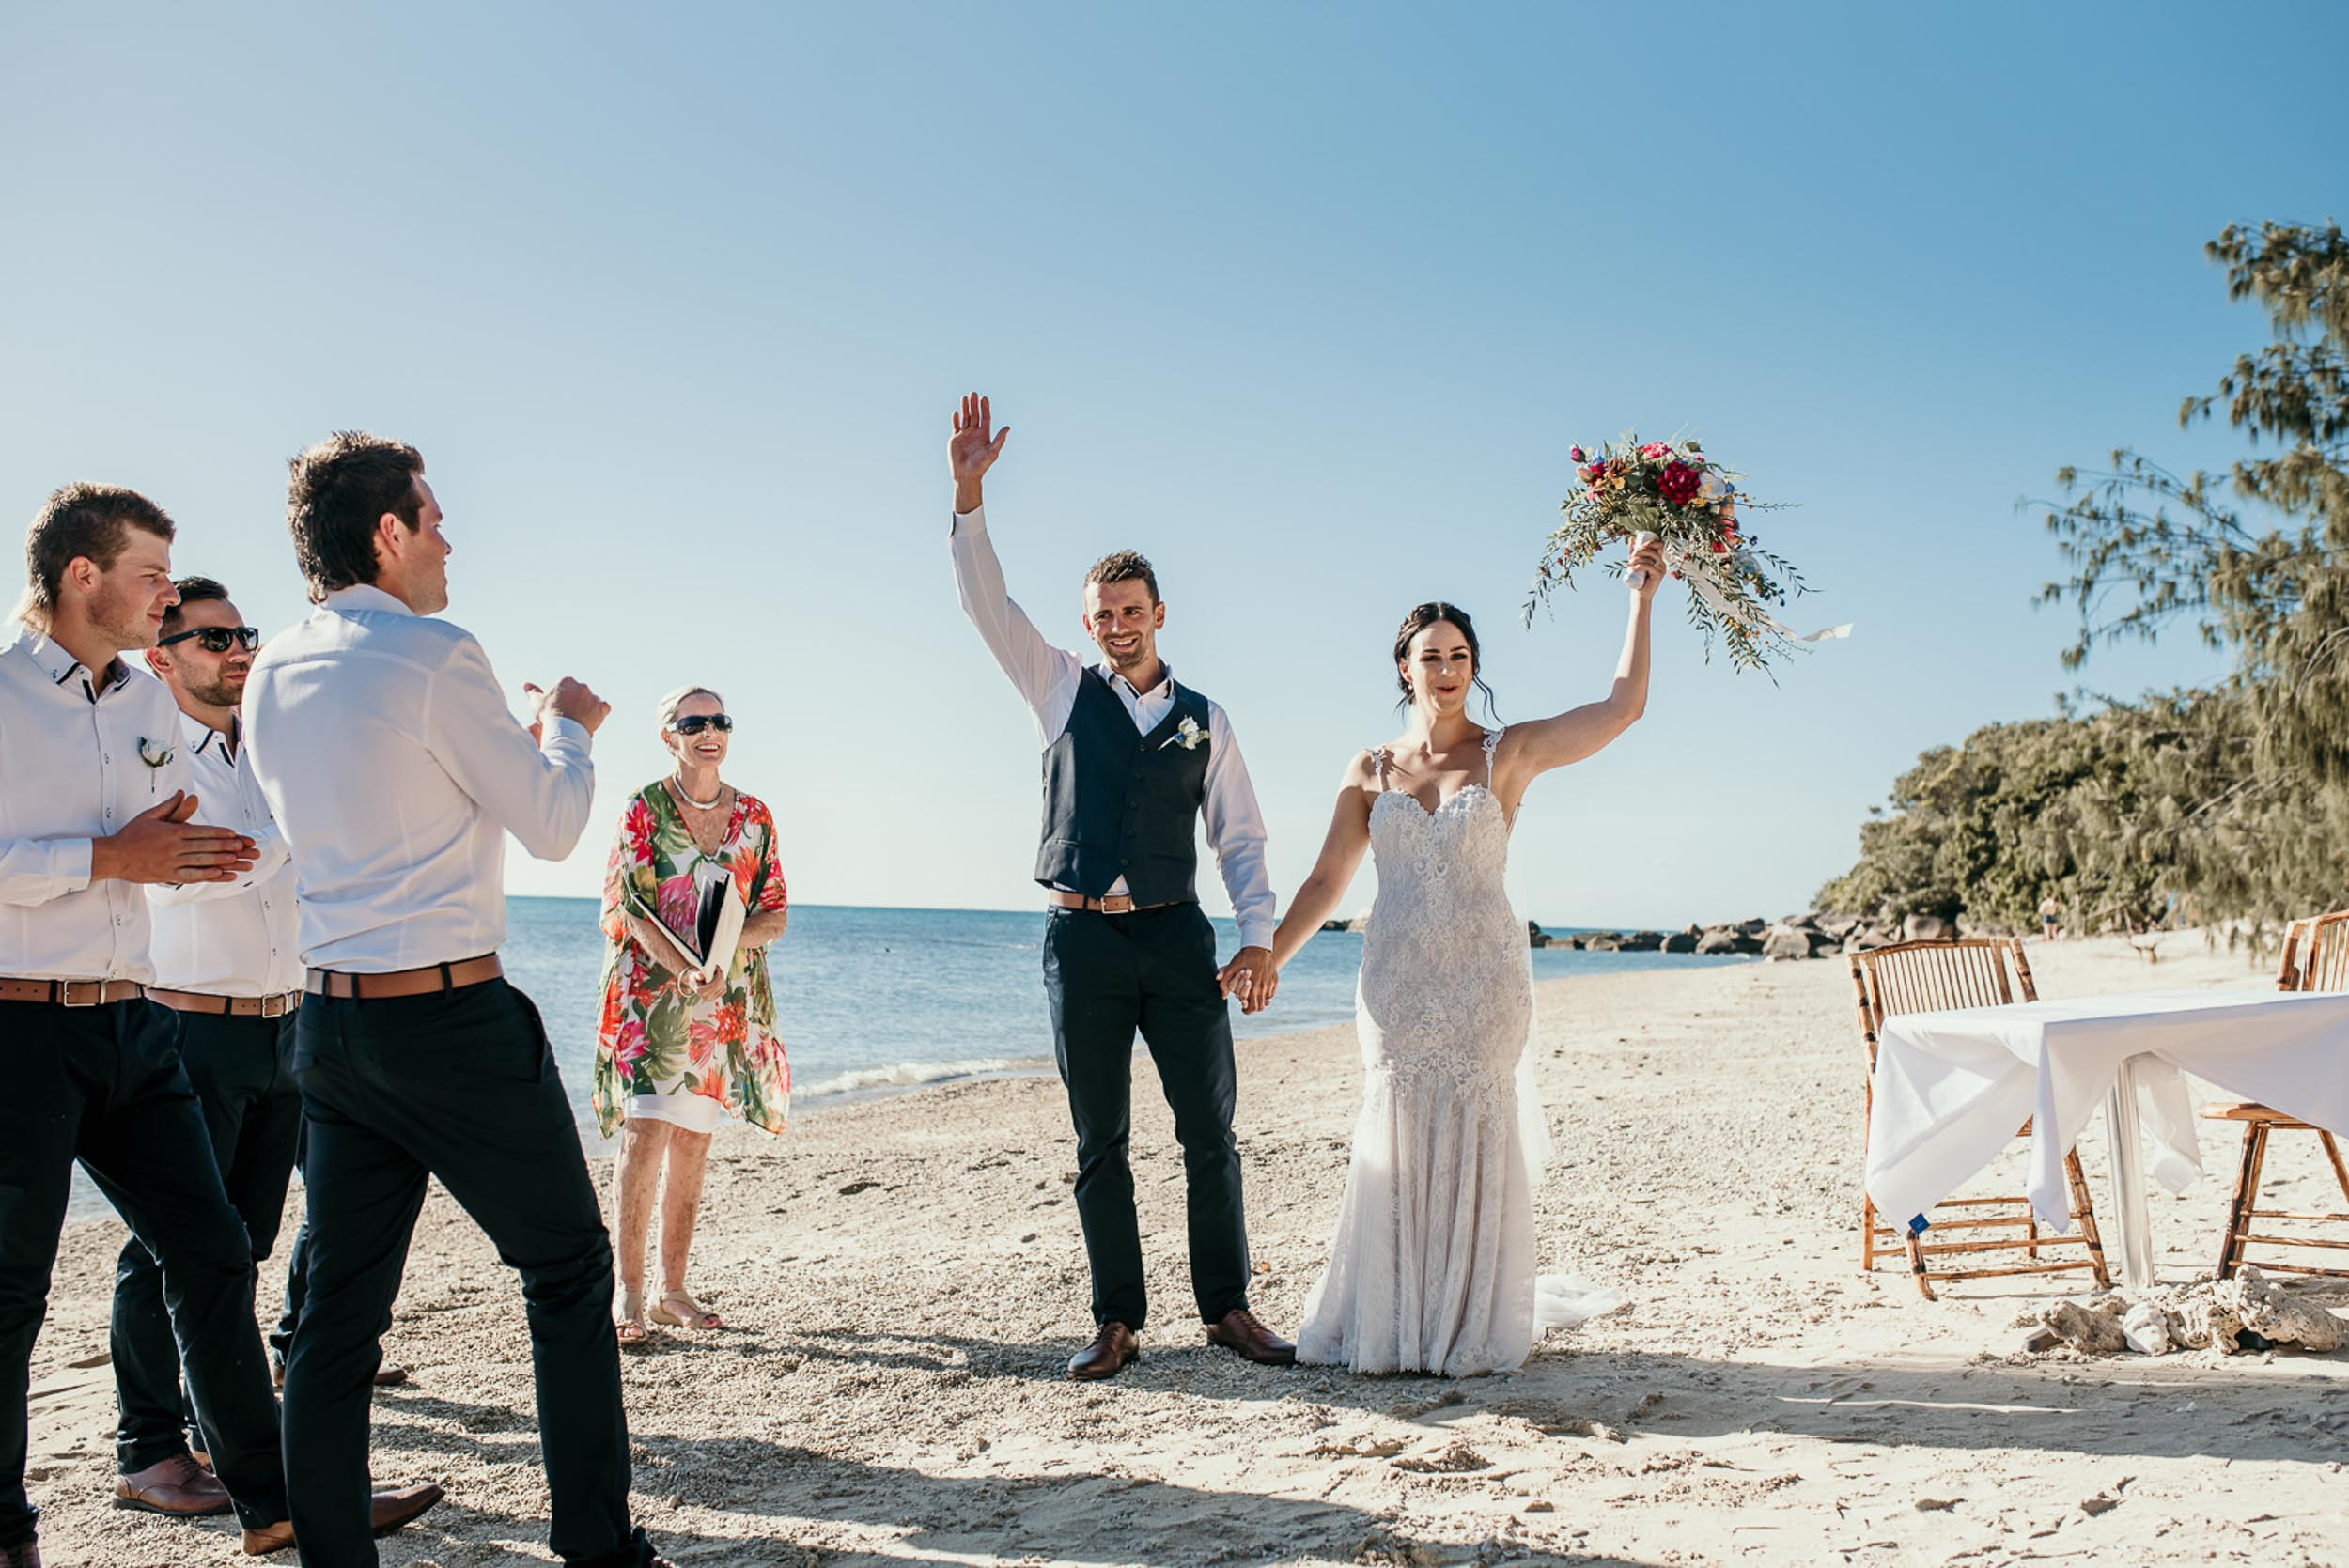 The Raw Photographer - Cairns Wedding Photographer - Fitzroy Island - Destination Wedding - Bride Dress - Groom Portrait - Queensland-25.jpg